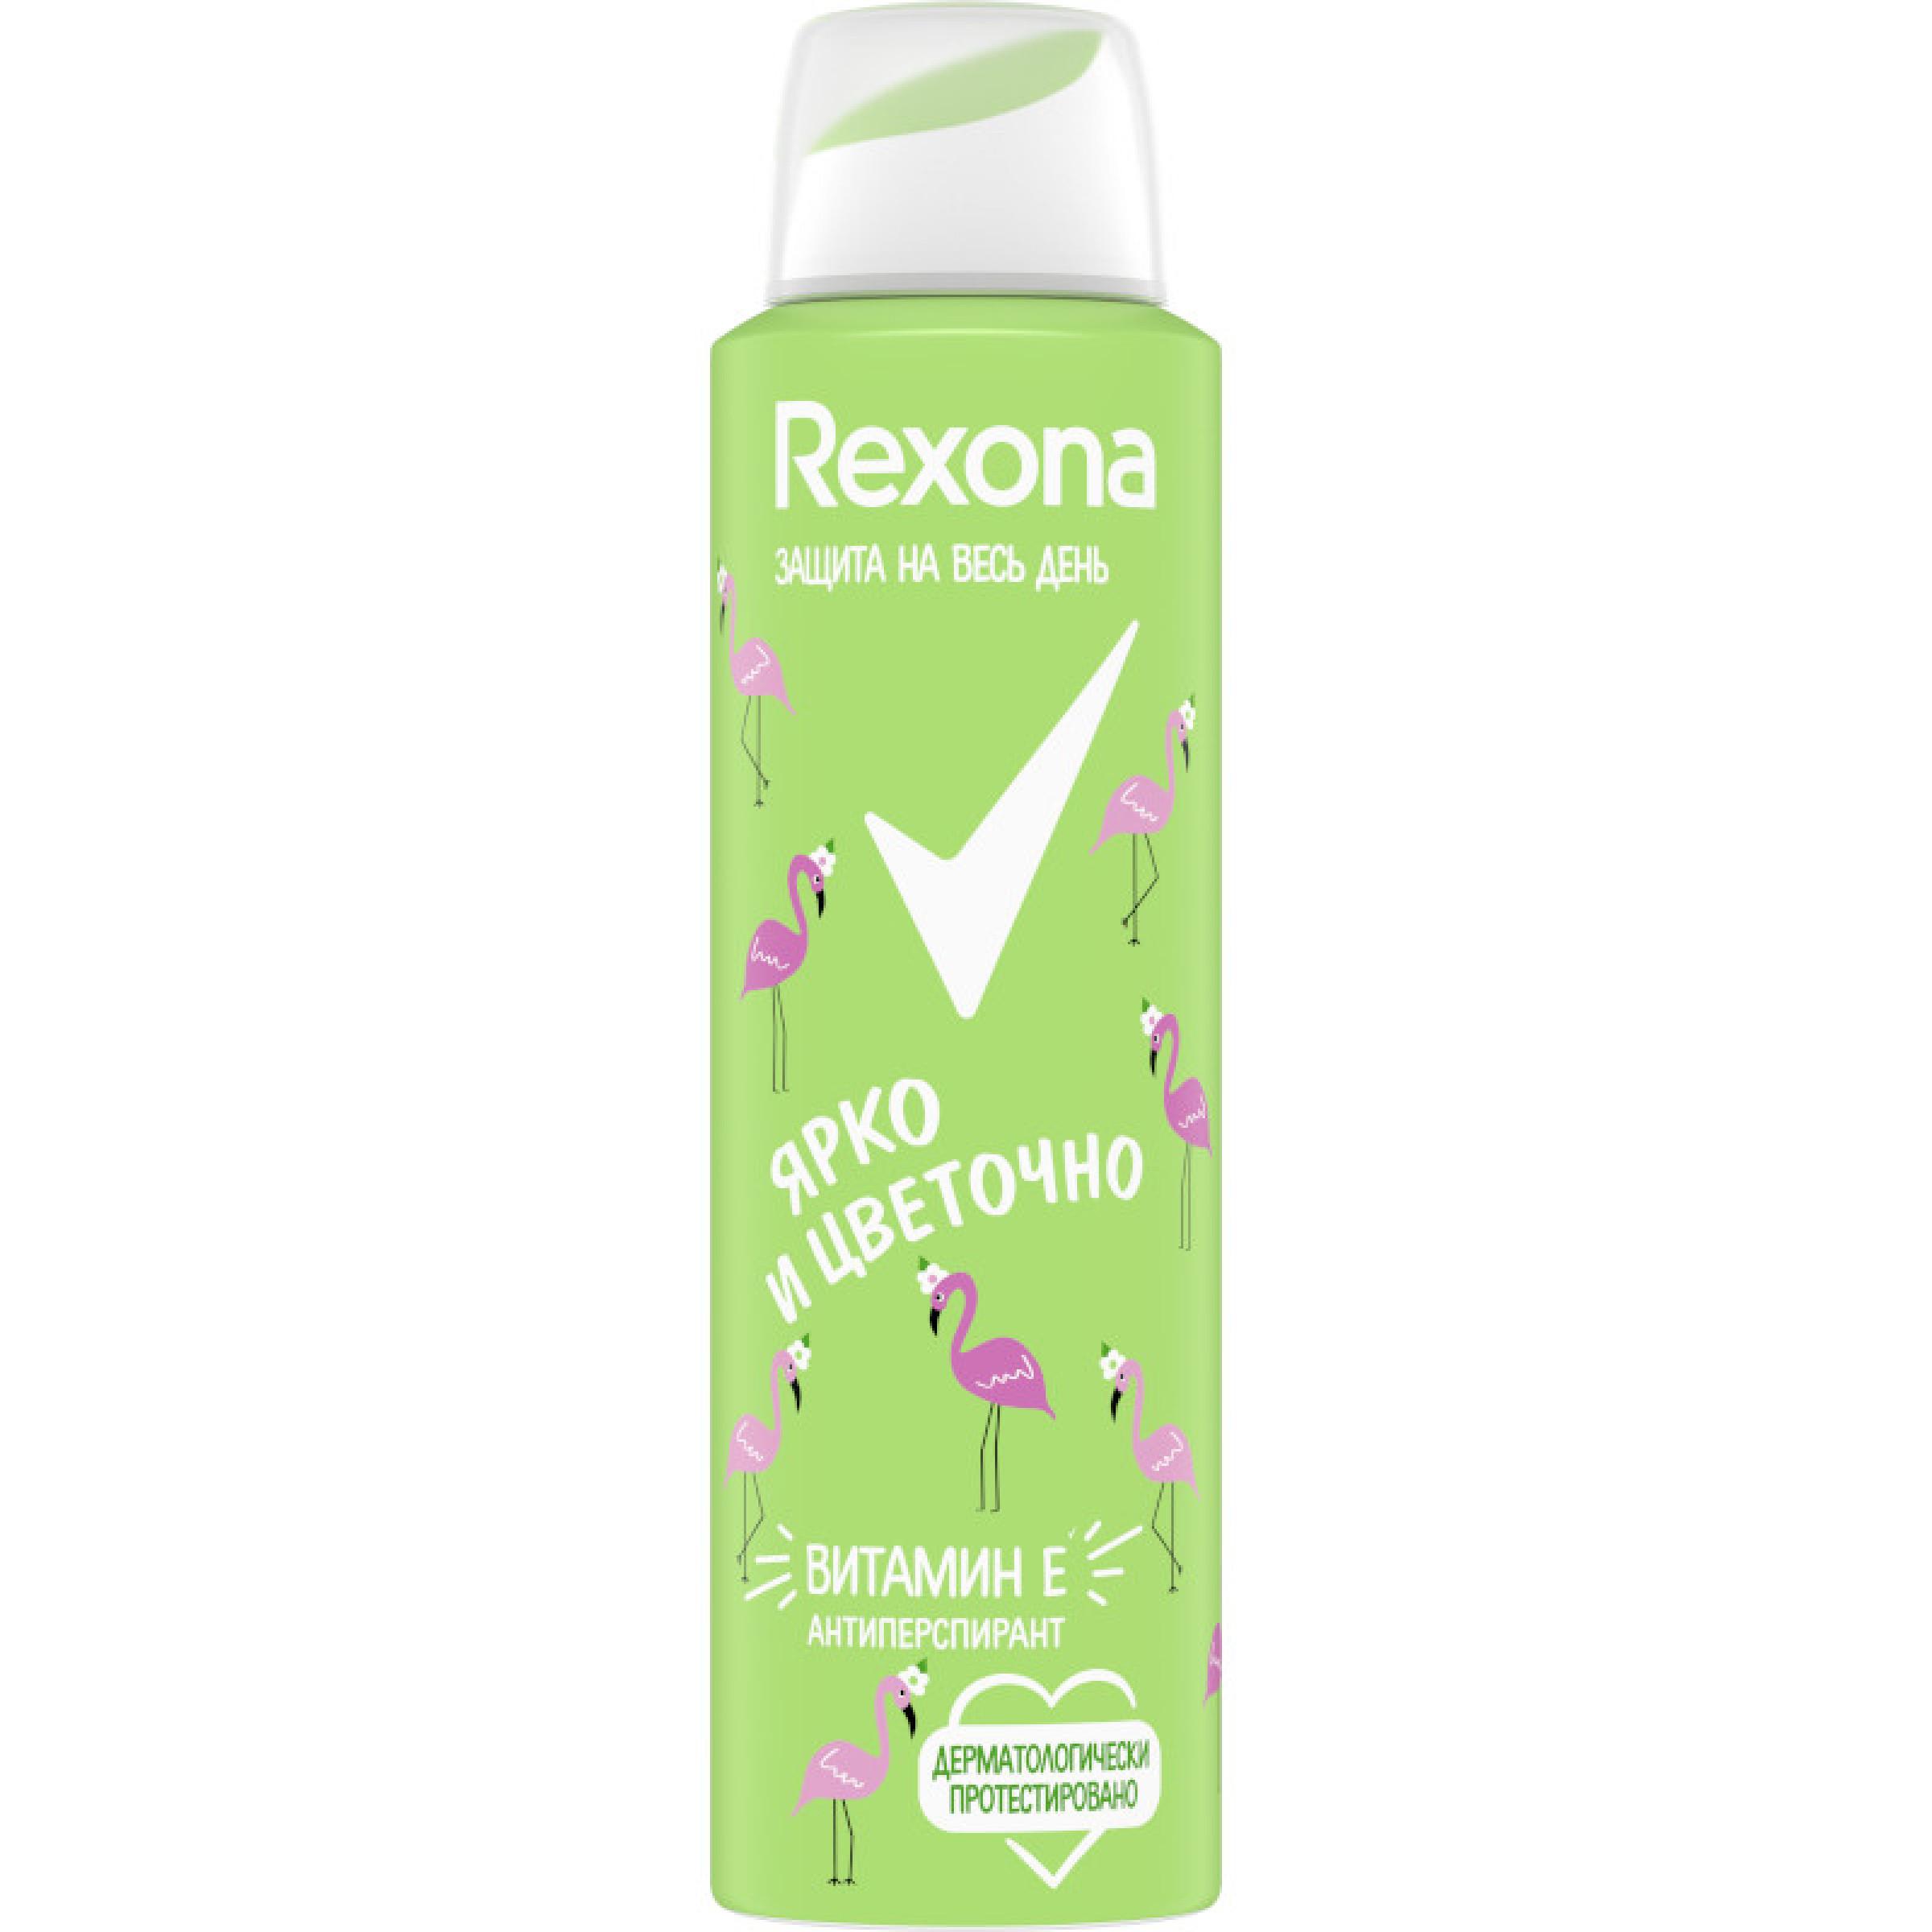 "Антиперспирант-дезодорант спрей ""Rexona"" Ярко и цветочно, 150 мл"